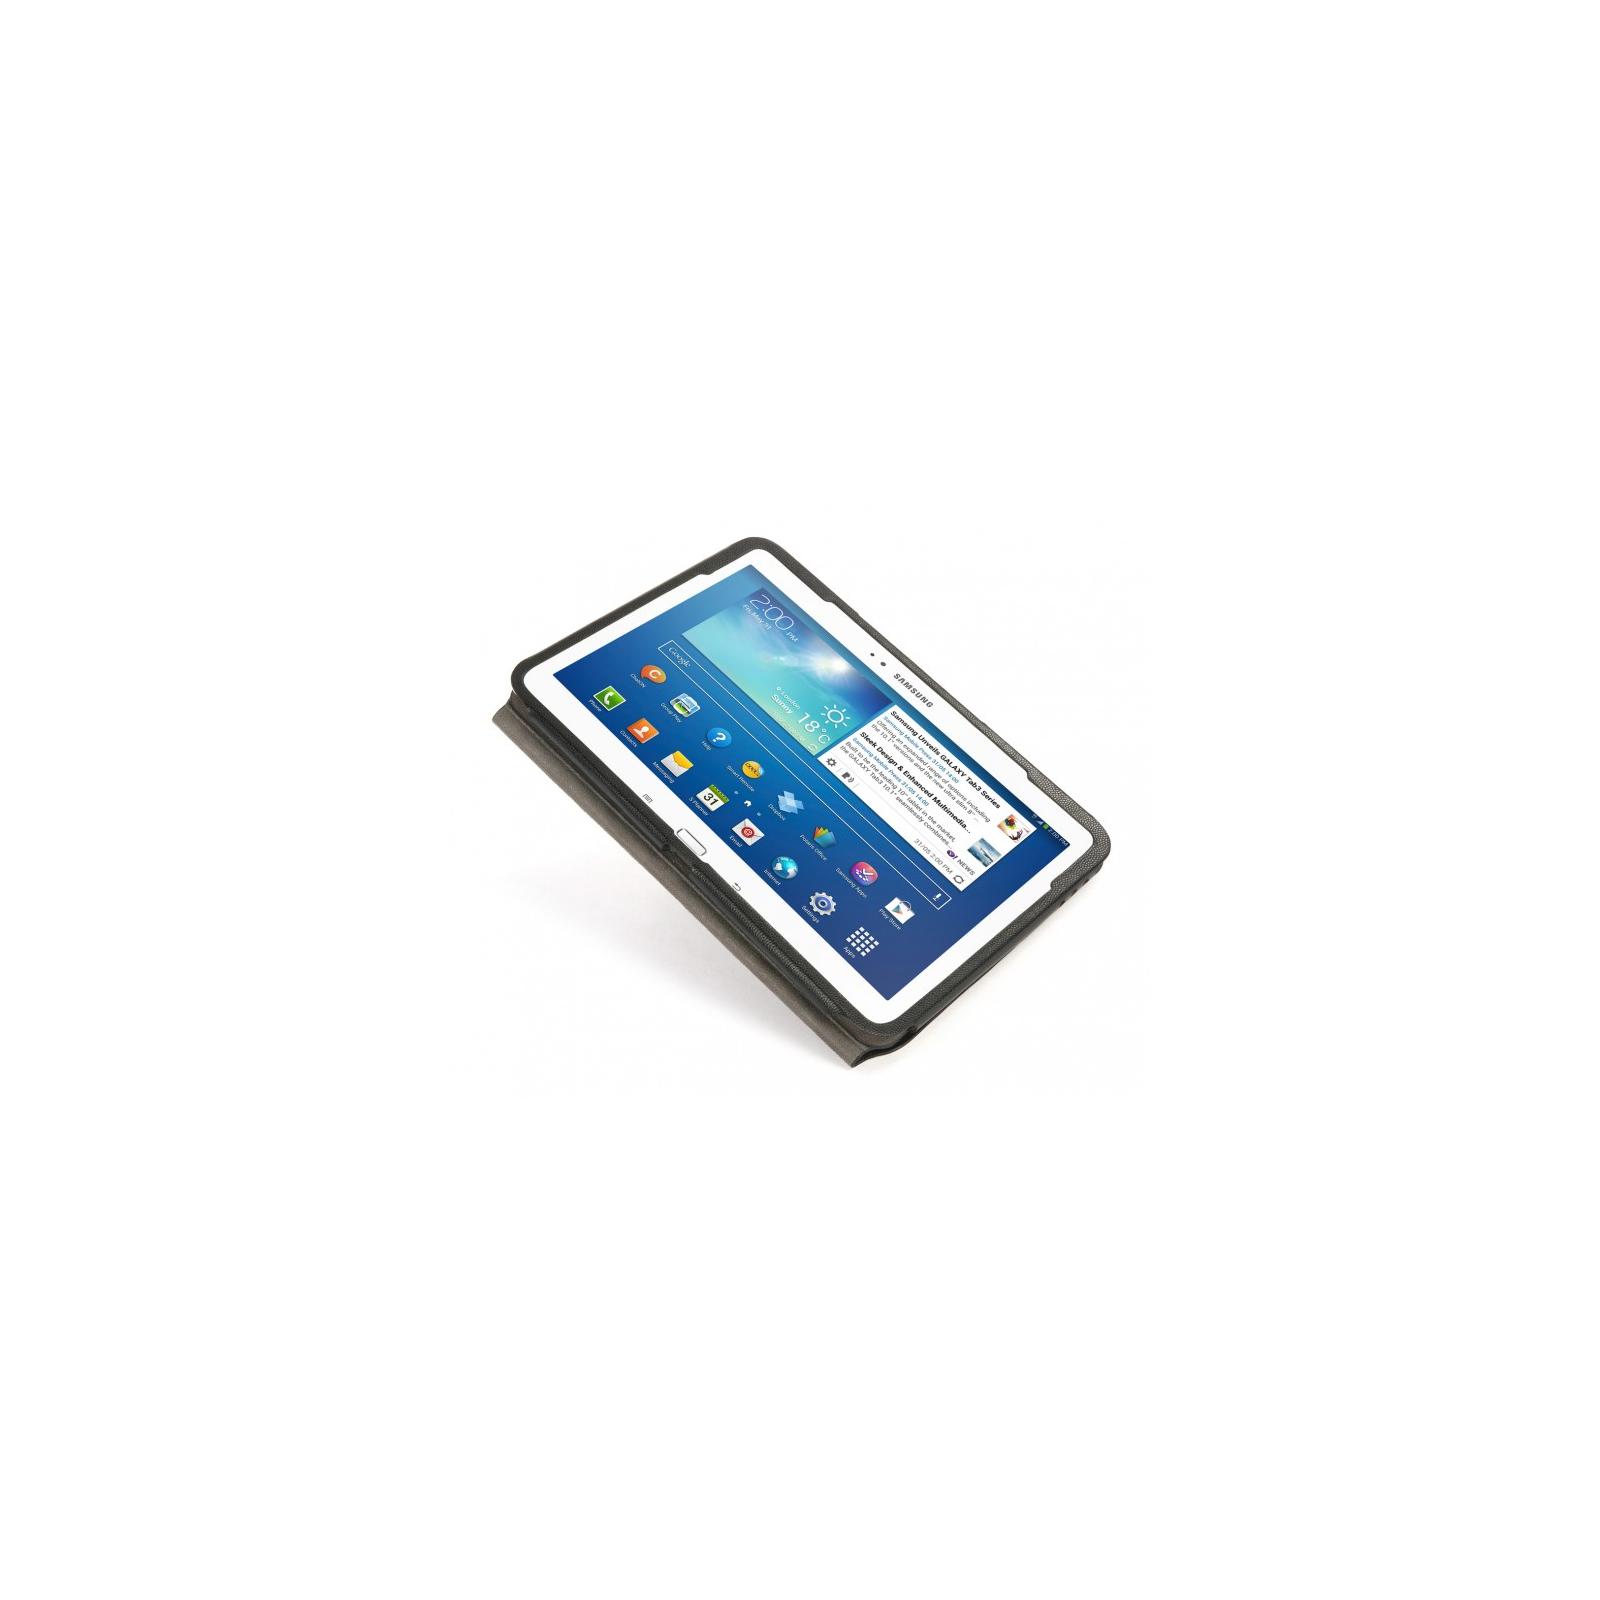 Чехол для планшета Tucano Galaxy Tab 3 10.1 Leggero Black (TAB-LS310) изображение 6